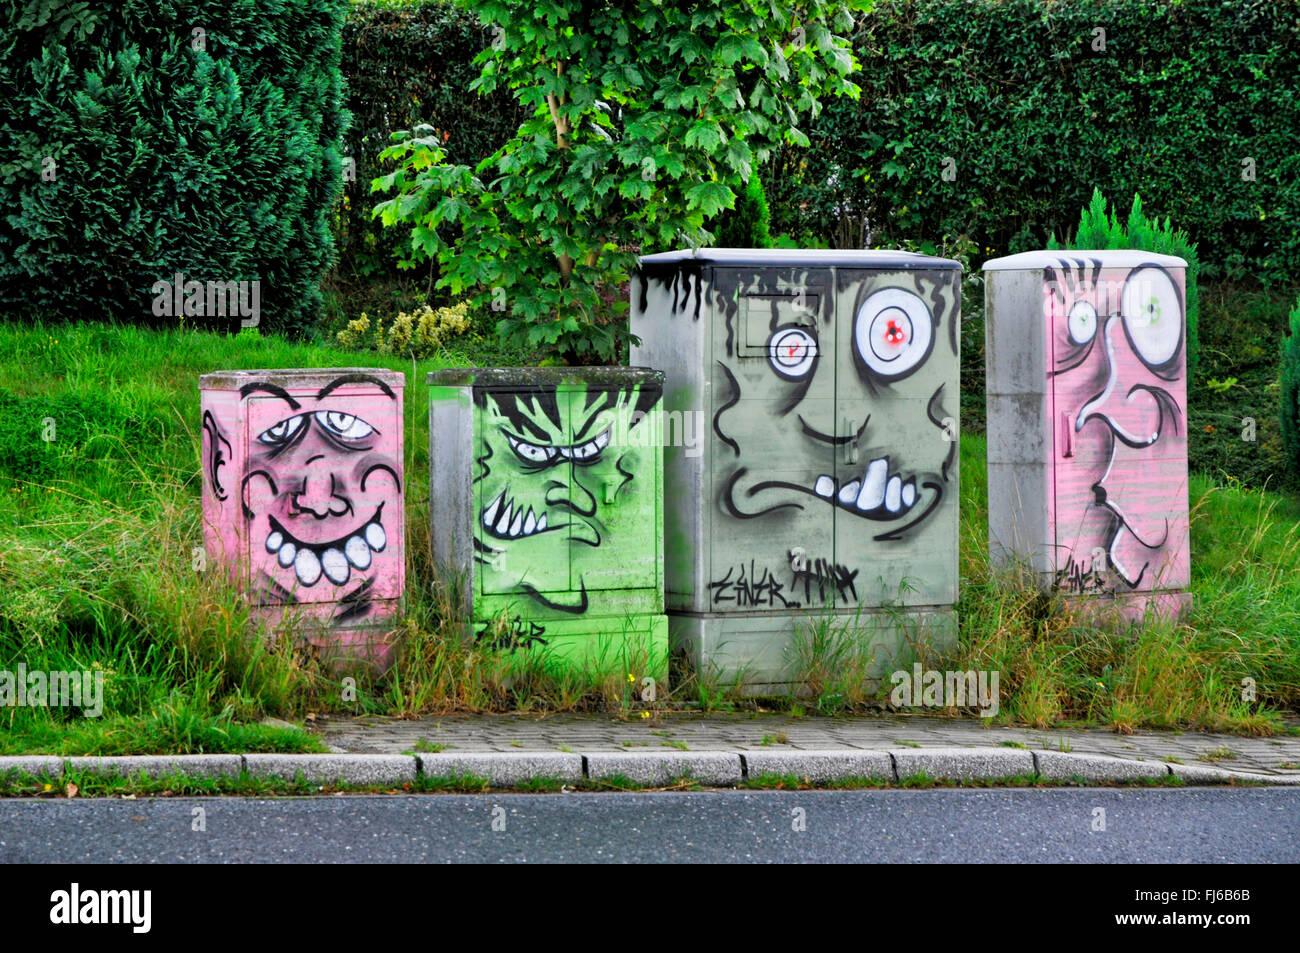 fuse box monsters, Germany, North Rhine-Westphalia, Ruhr Area, Bochum - Stock Image